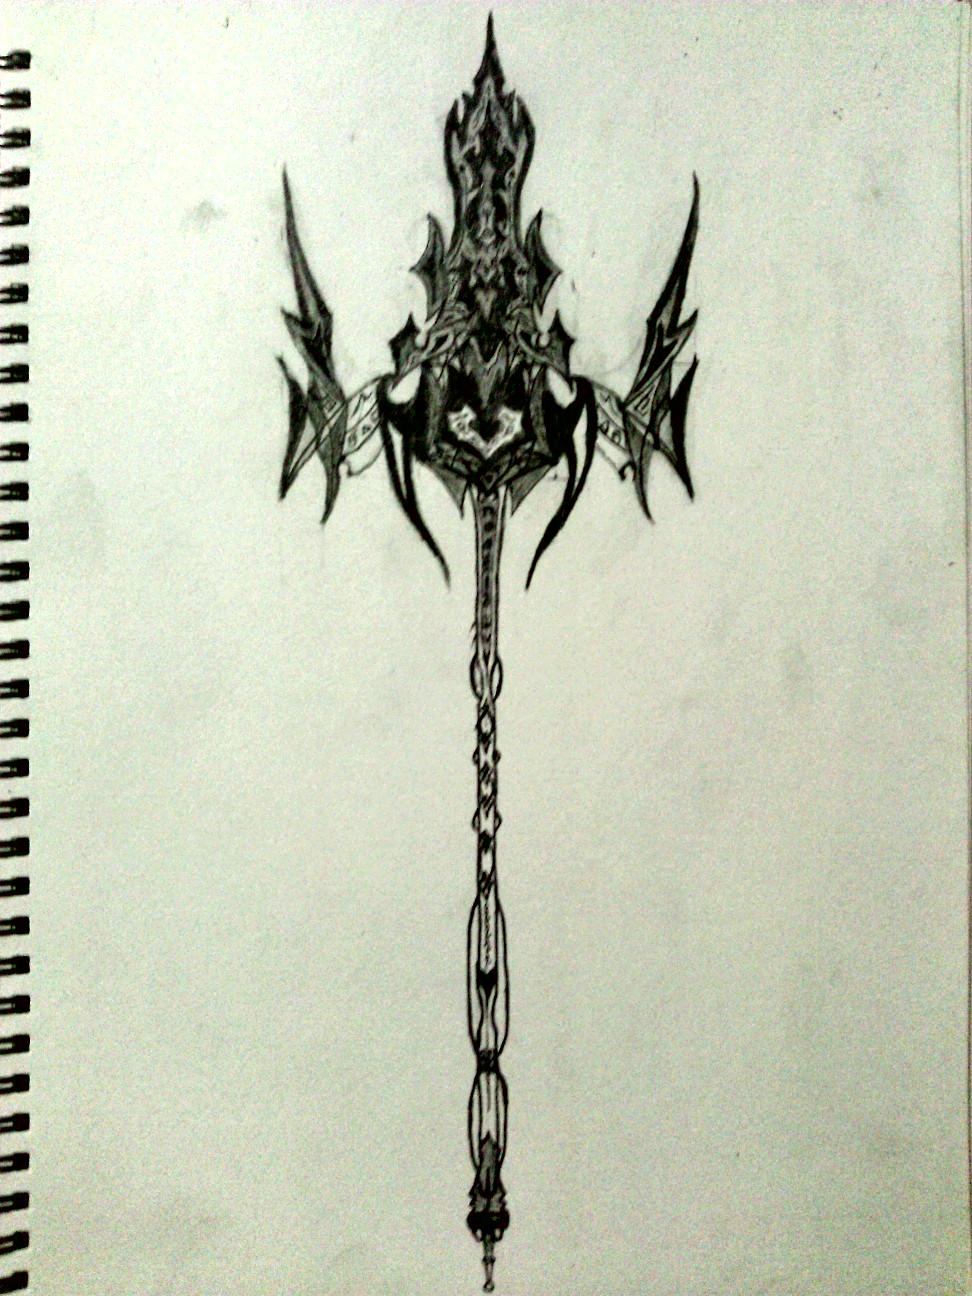 Poseidon Trident by Sacroth on DeviantArt